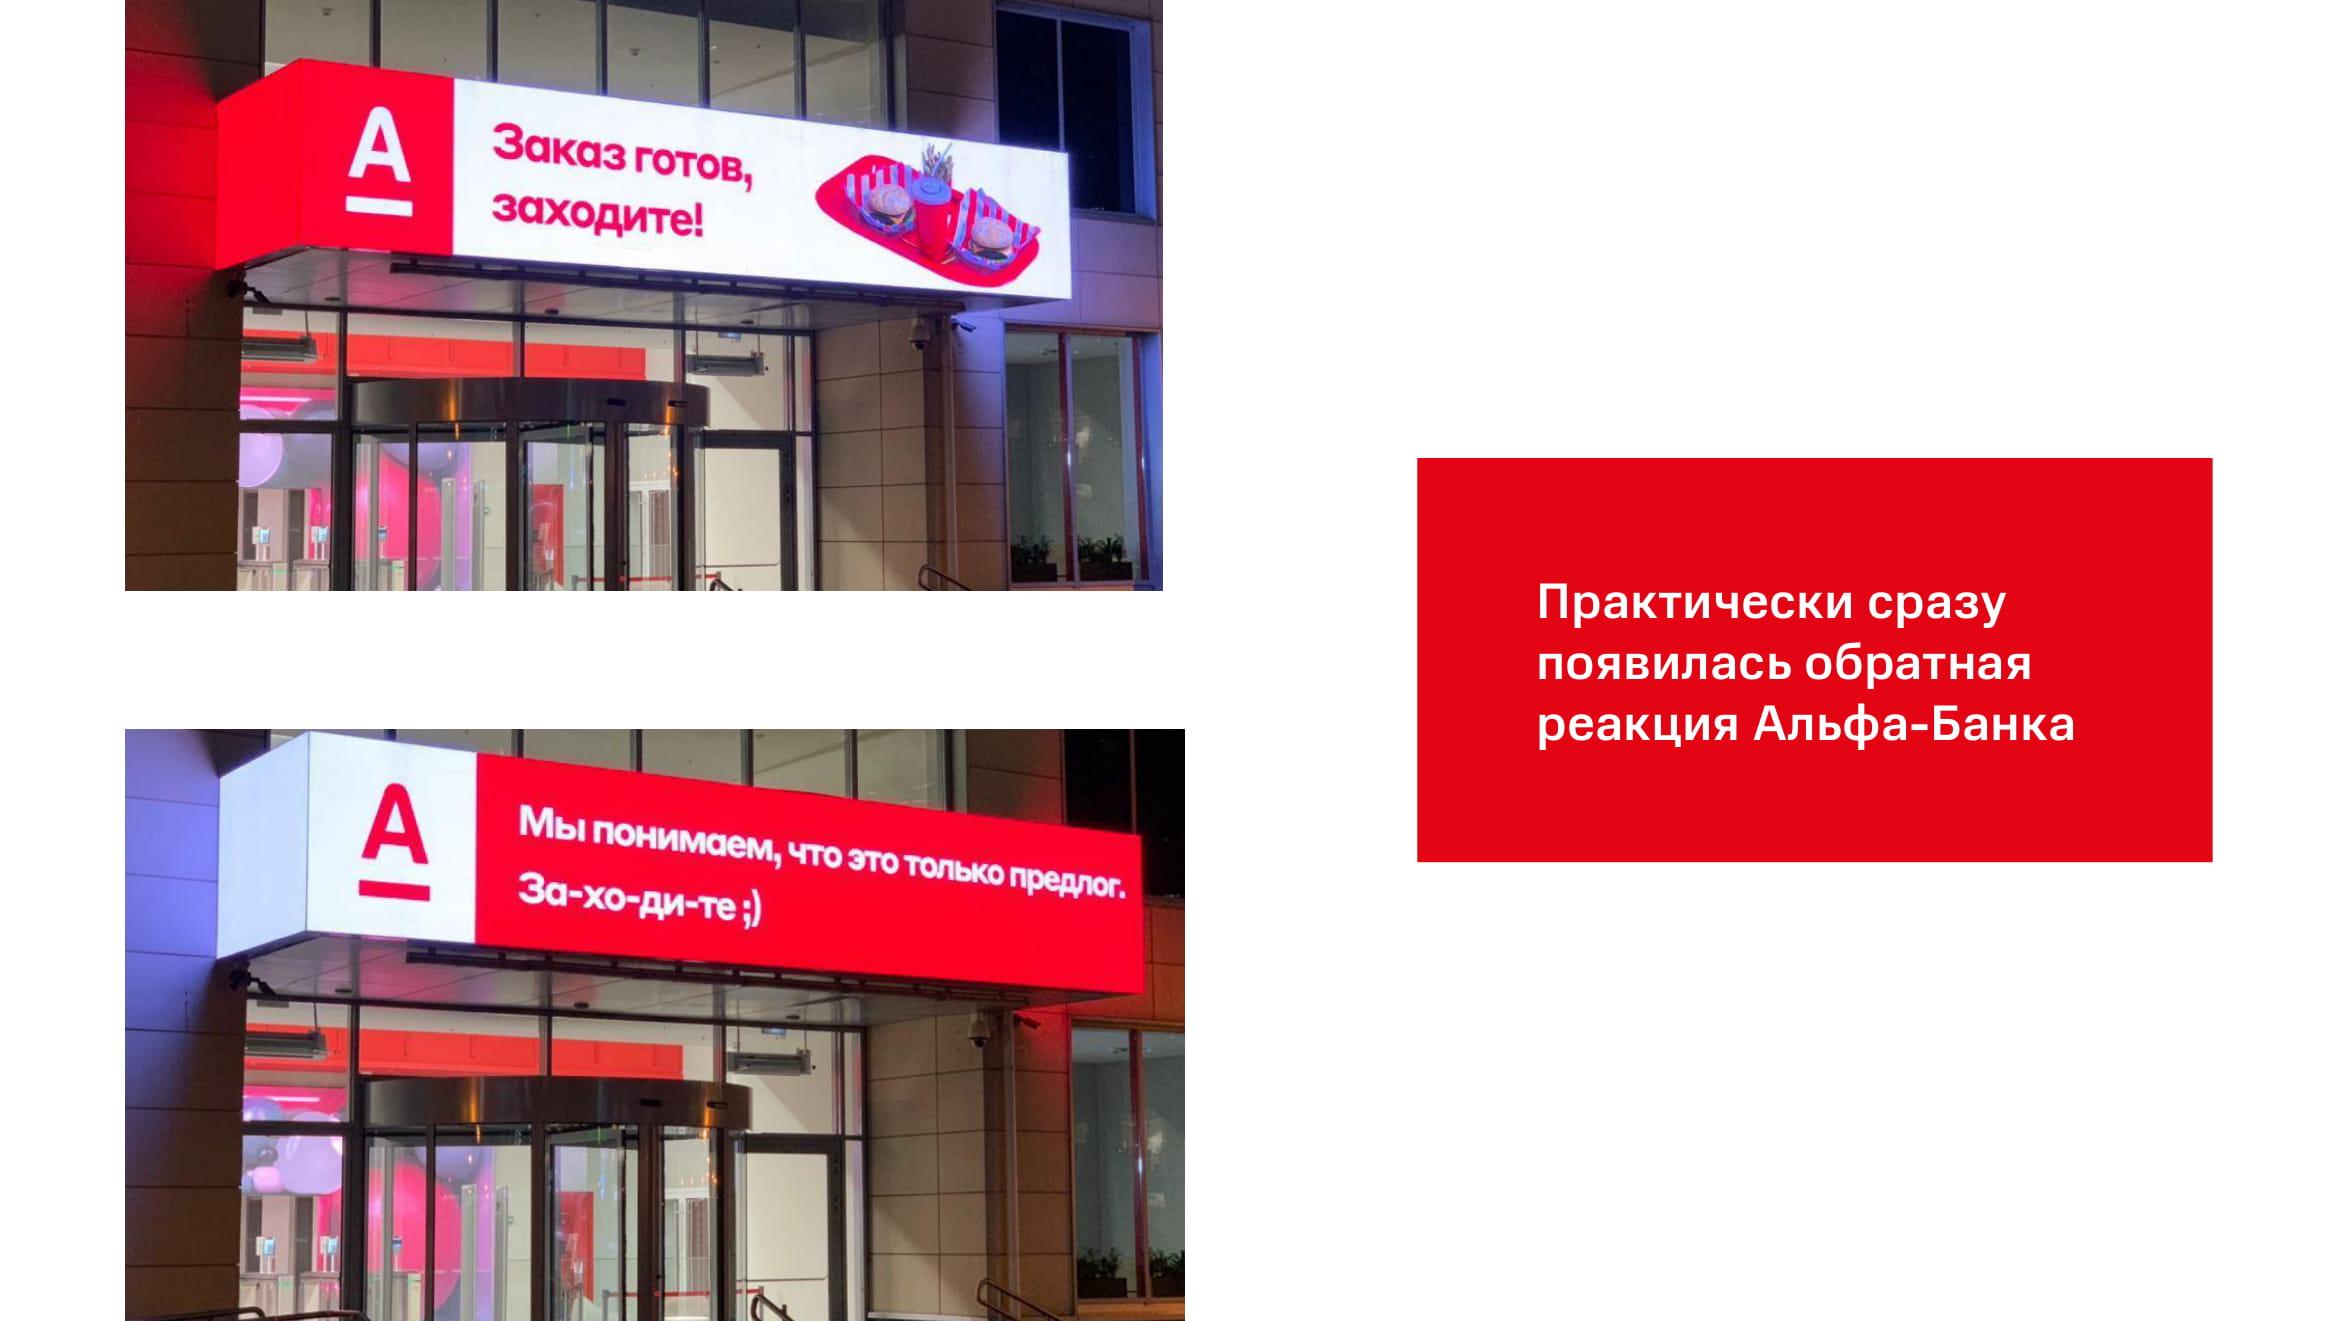 RFA_Креатив-года-2020_МТС-Банк-VS-Альфа-Банк-07